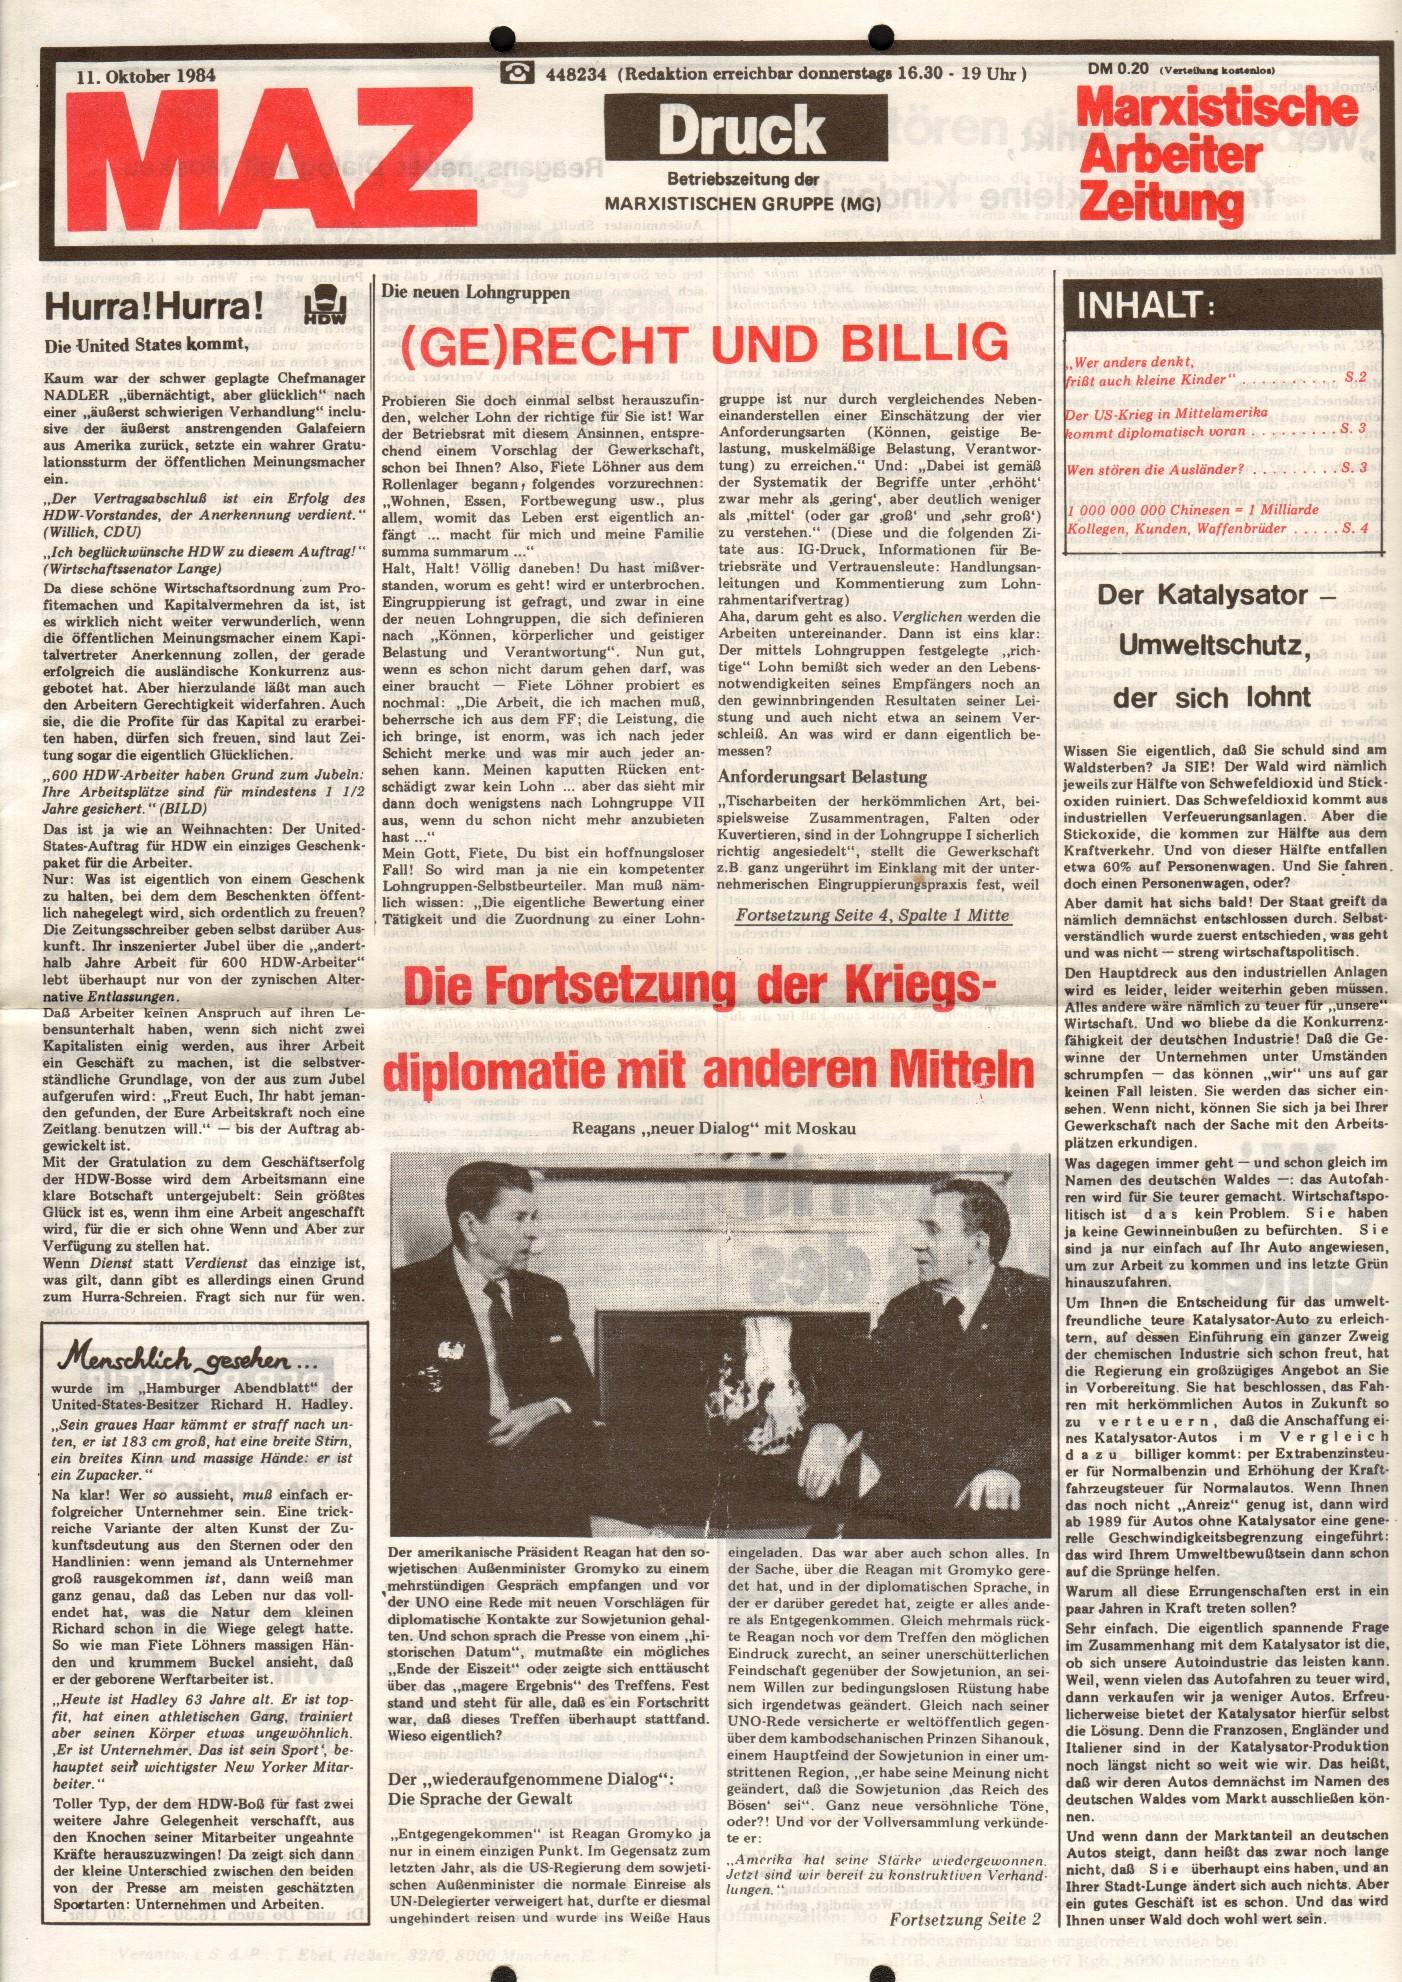 Hamburg_MG_MAZ_Druck_19841011_01